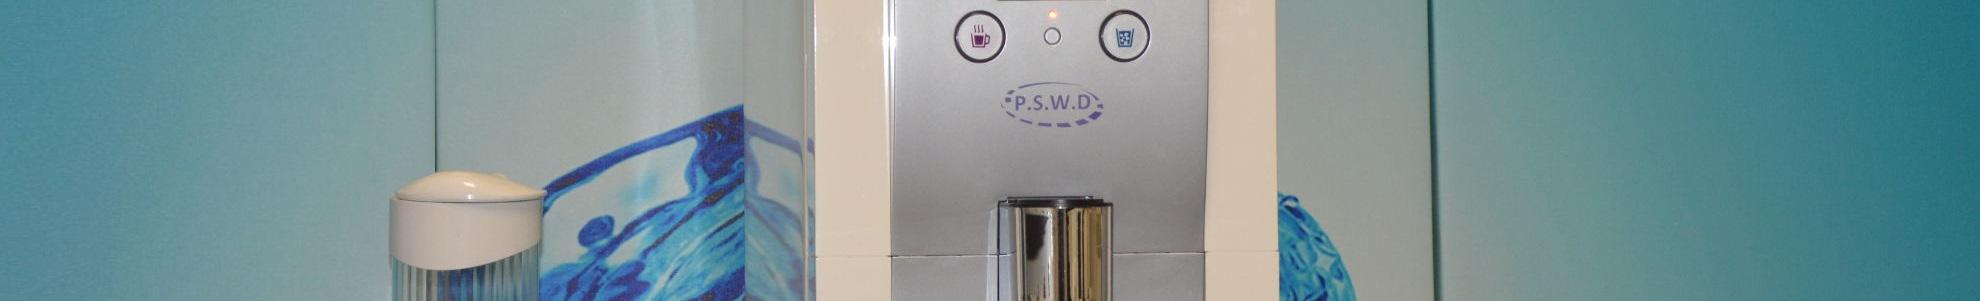 water-dispenser-panice (1)